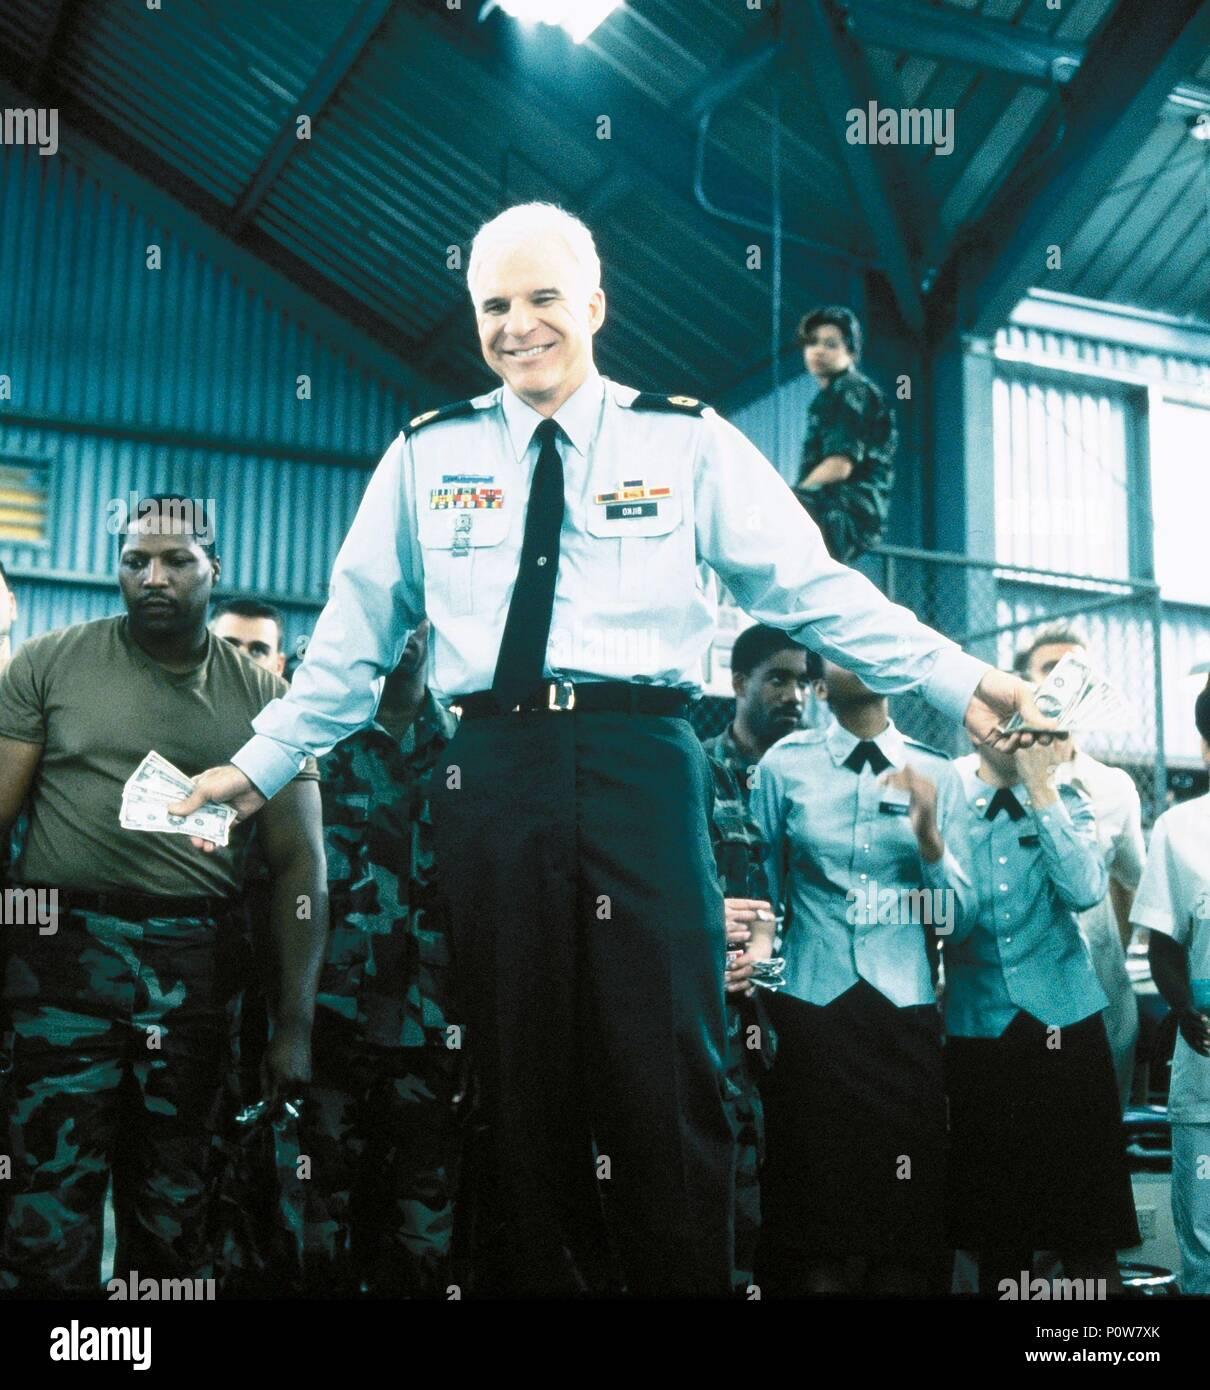 Original Film Title: SGT BILKO.  English Title: SGT BILKO.  Film Director: JONATHAN LYNN.  Year: 1996.  Stars: STEVE MARTIN. Credit: UNIVERSAL PICTURES / BATZDORFF, RON / Album - Stock Image